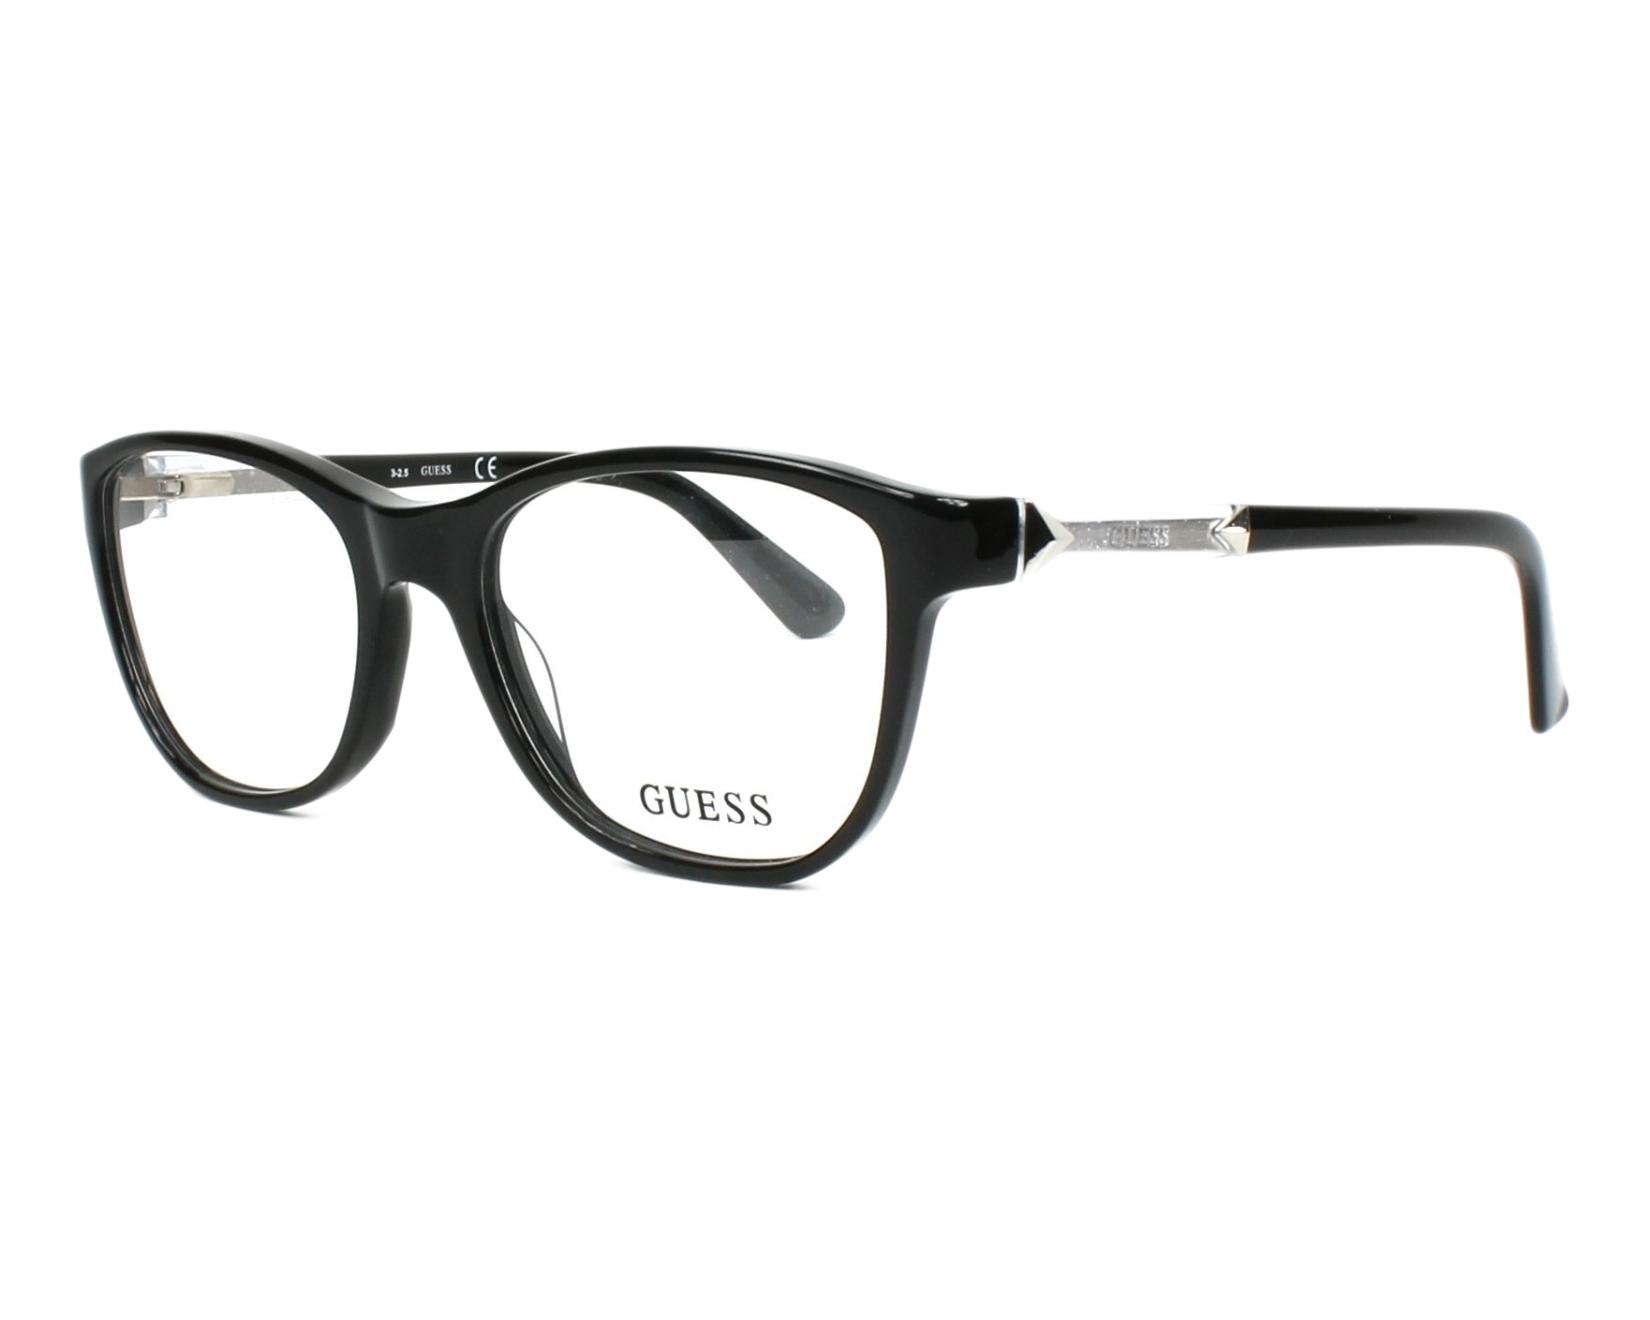 Guess Eyeglasses GU-2562 001 Black - Visionet UK